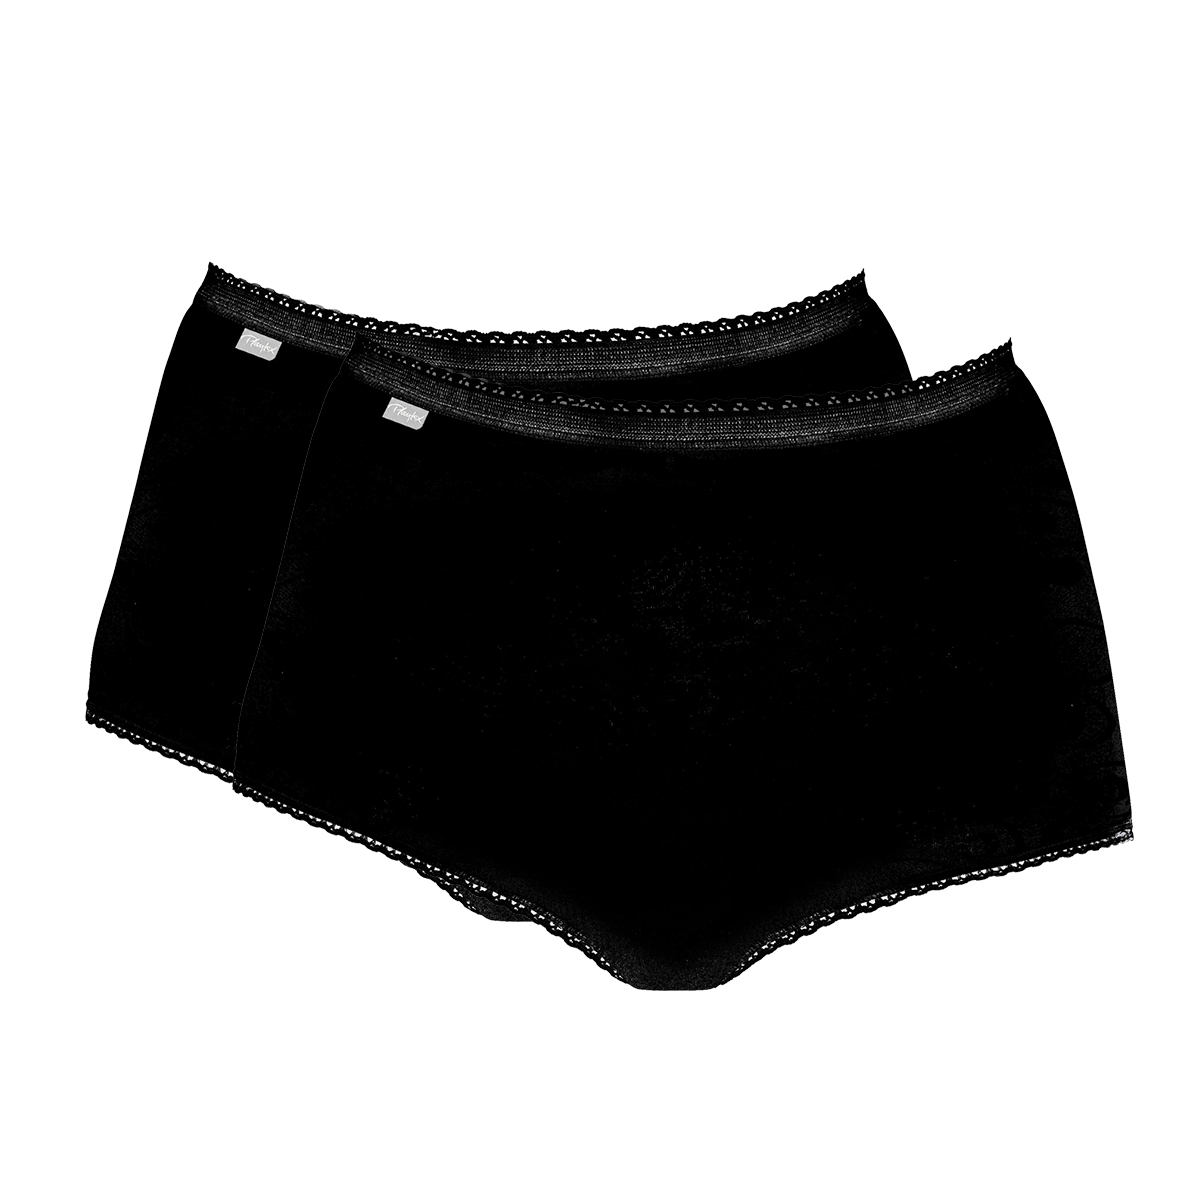 2 bragas maxi negras - Coton Stretch, , PLAYTEX